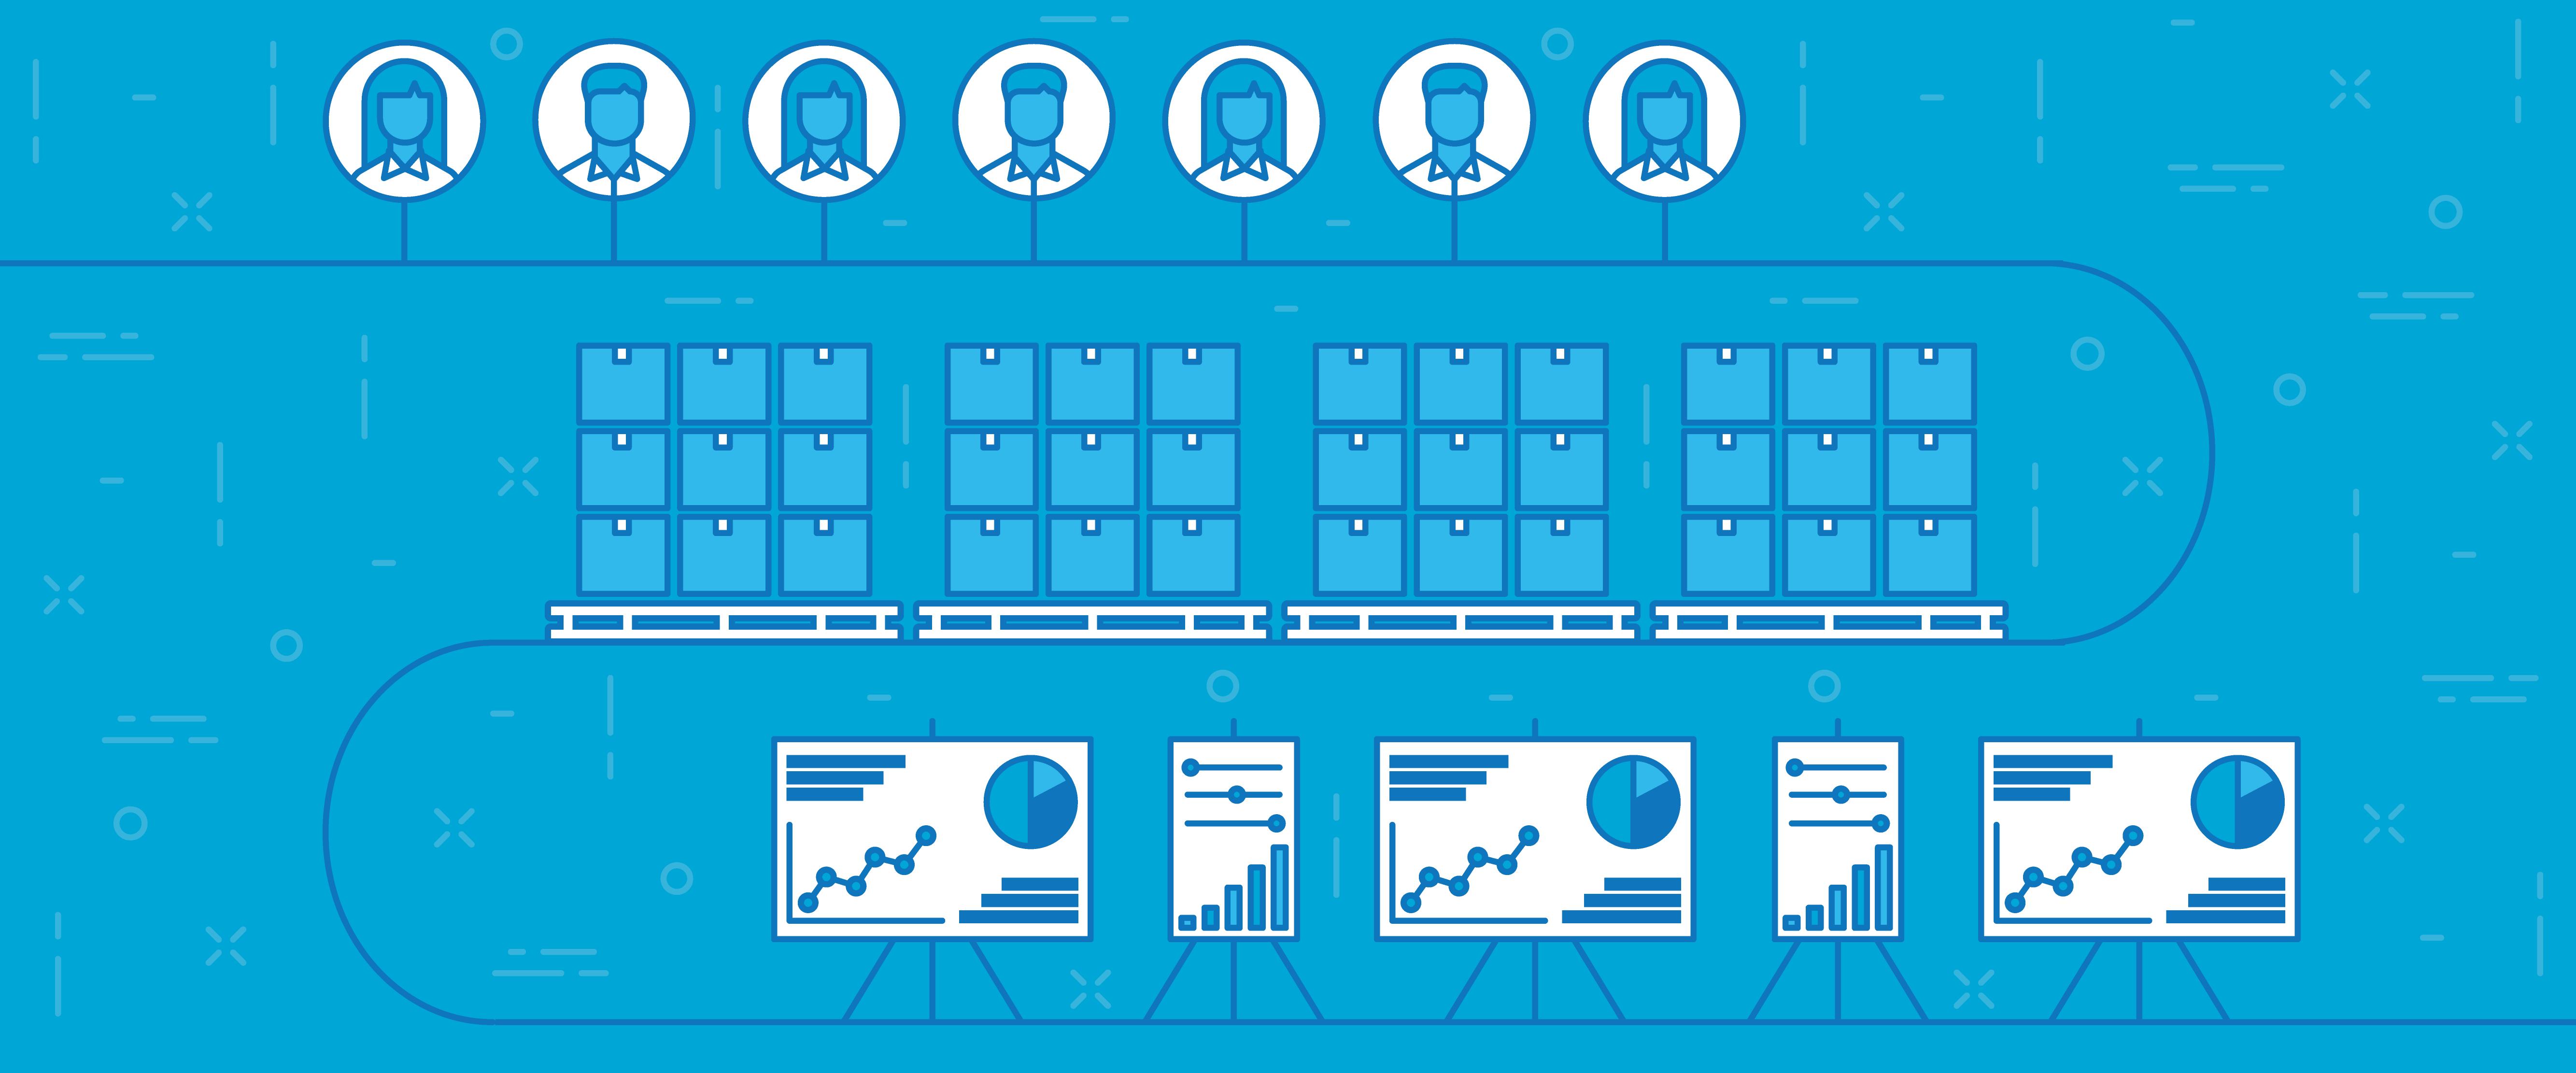 The Drawbacks of Hiring an Internal E-Commerce Team